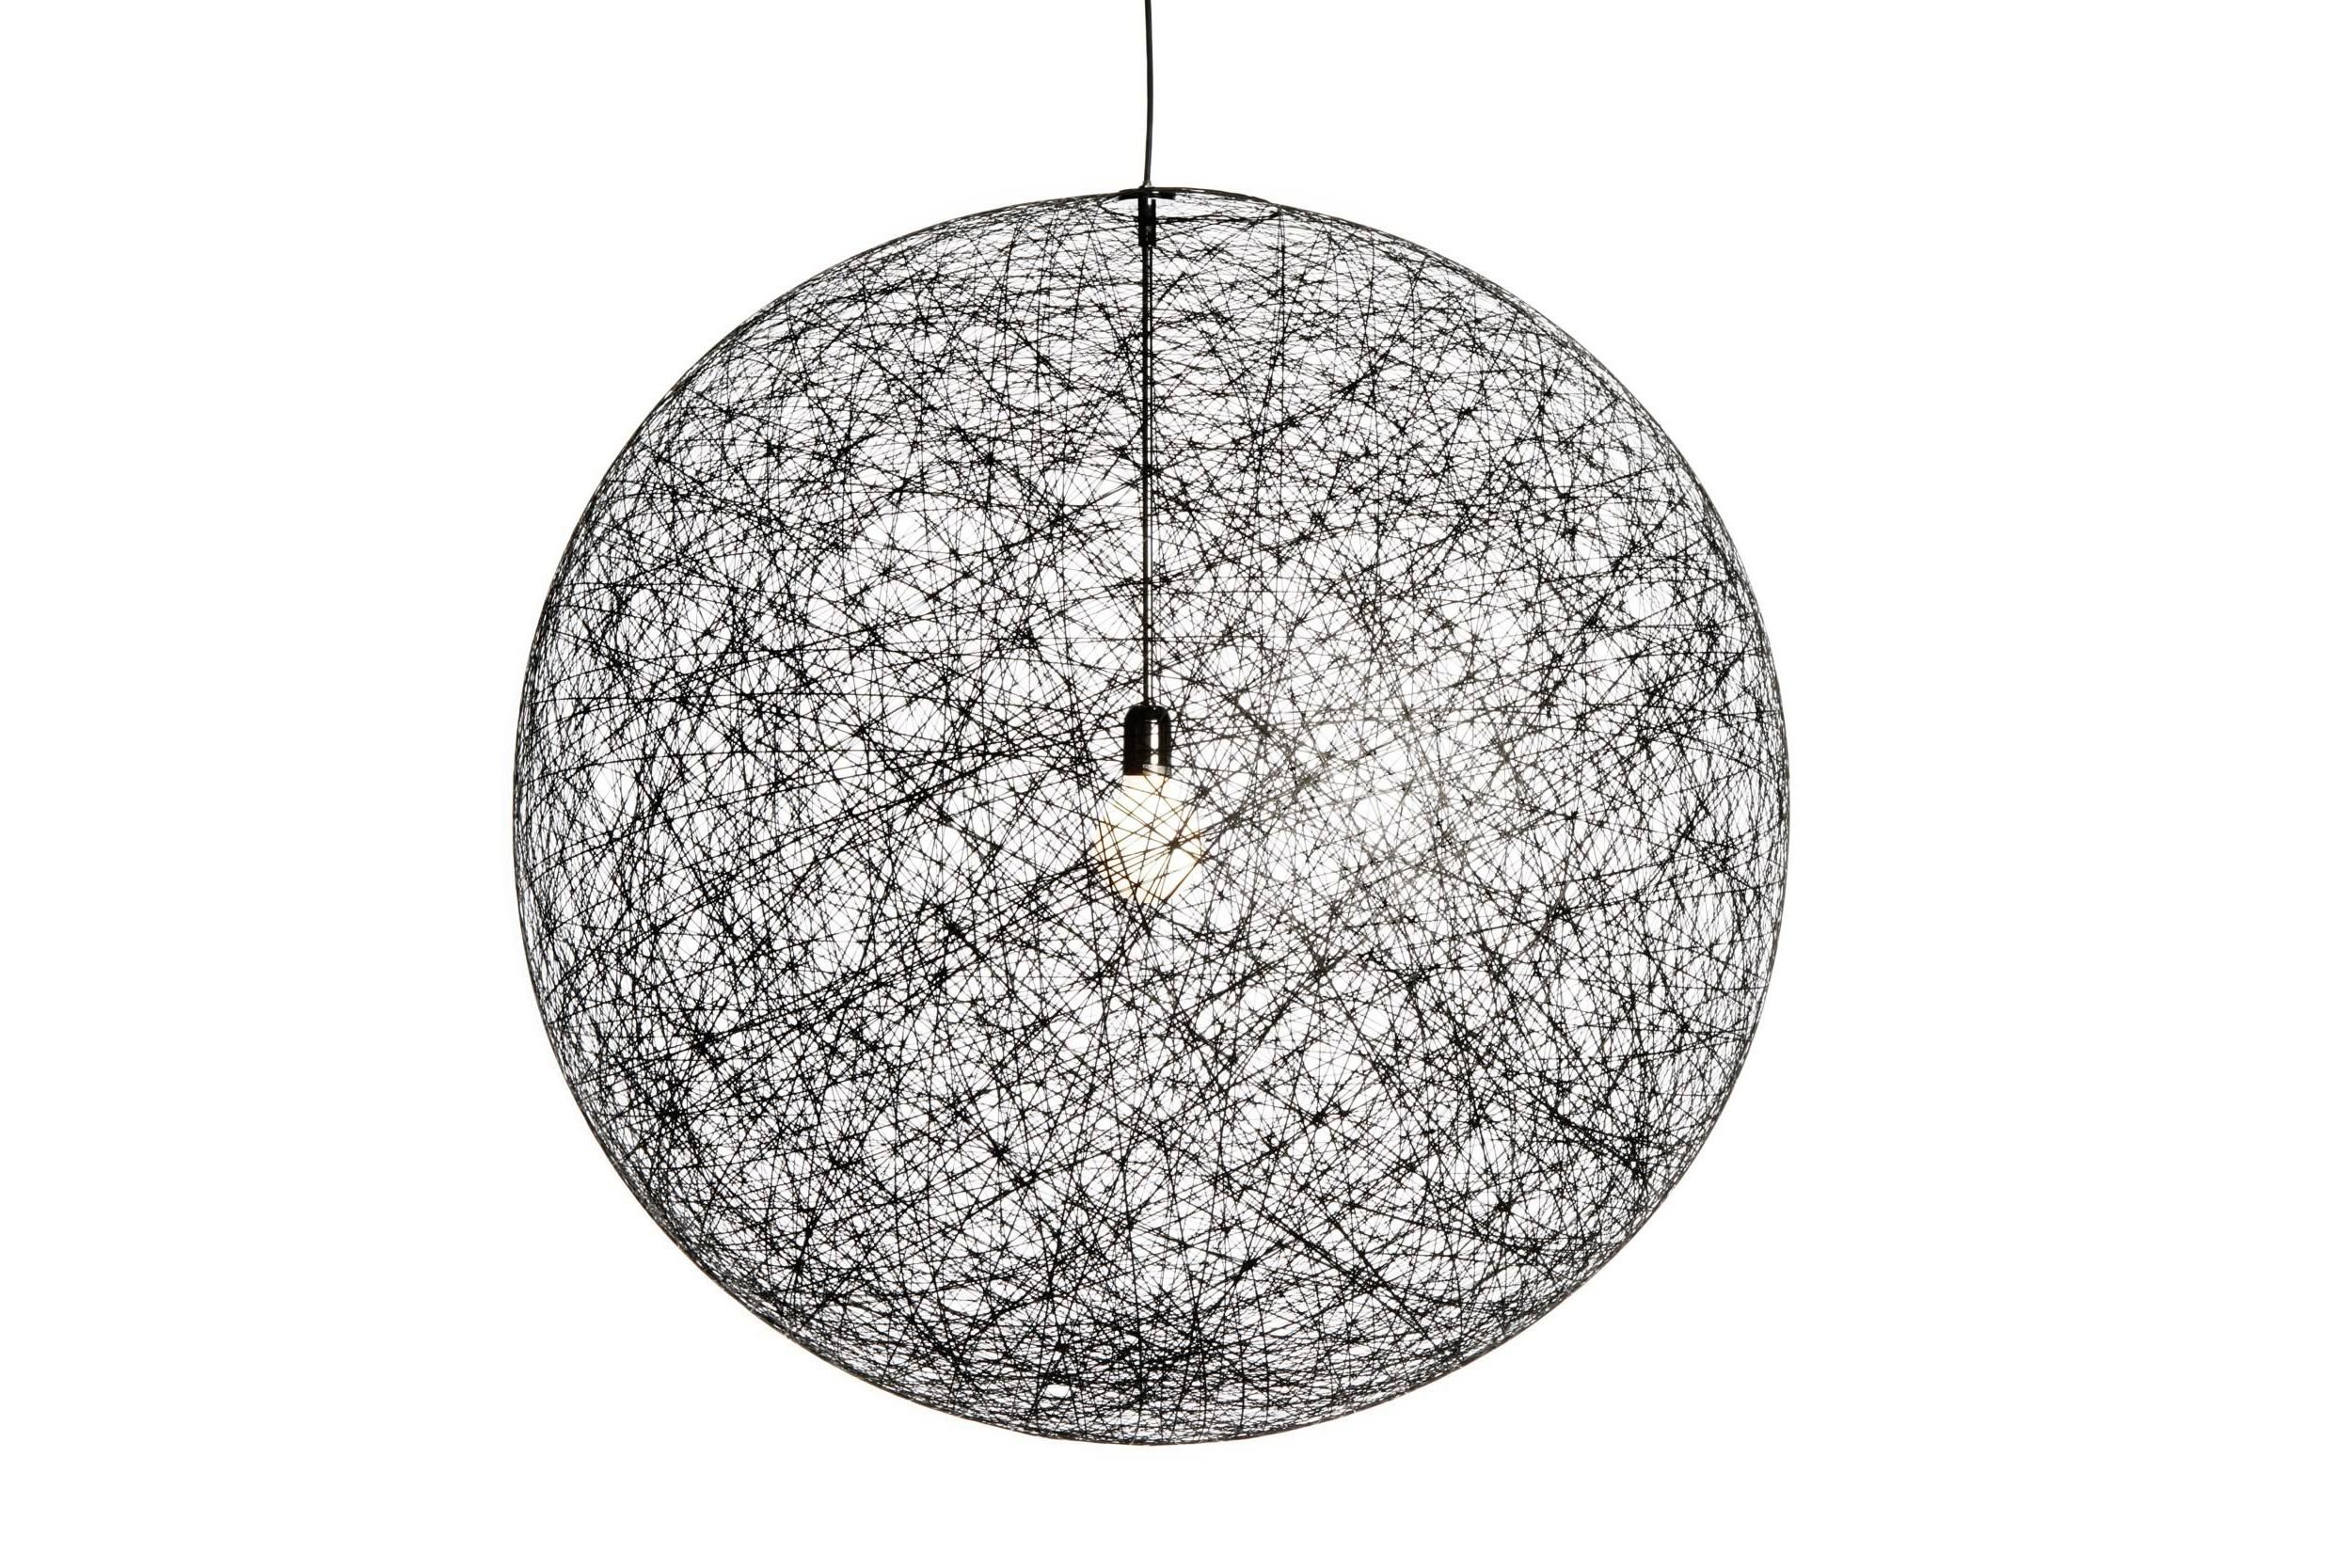 Random 1 Light Globe Pendant Throughout Popular 1 Light Globe Pendants (View 16 of 20)